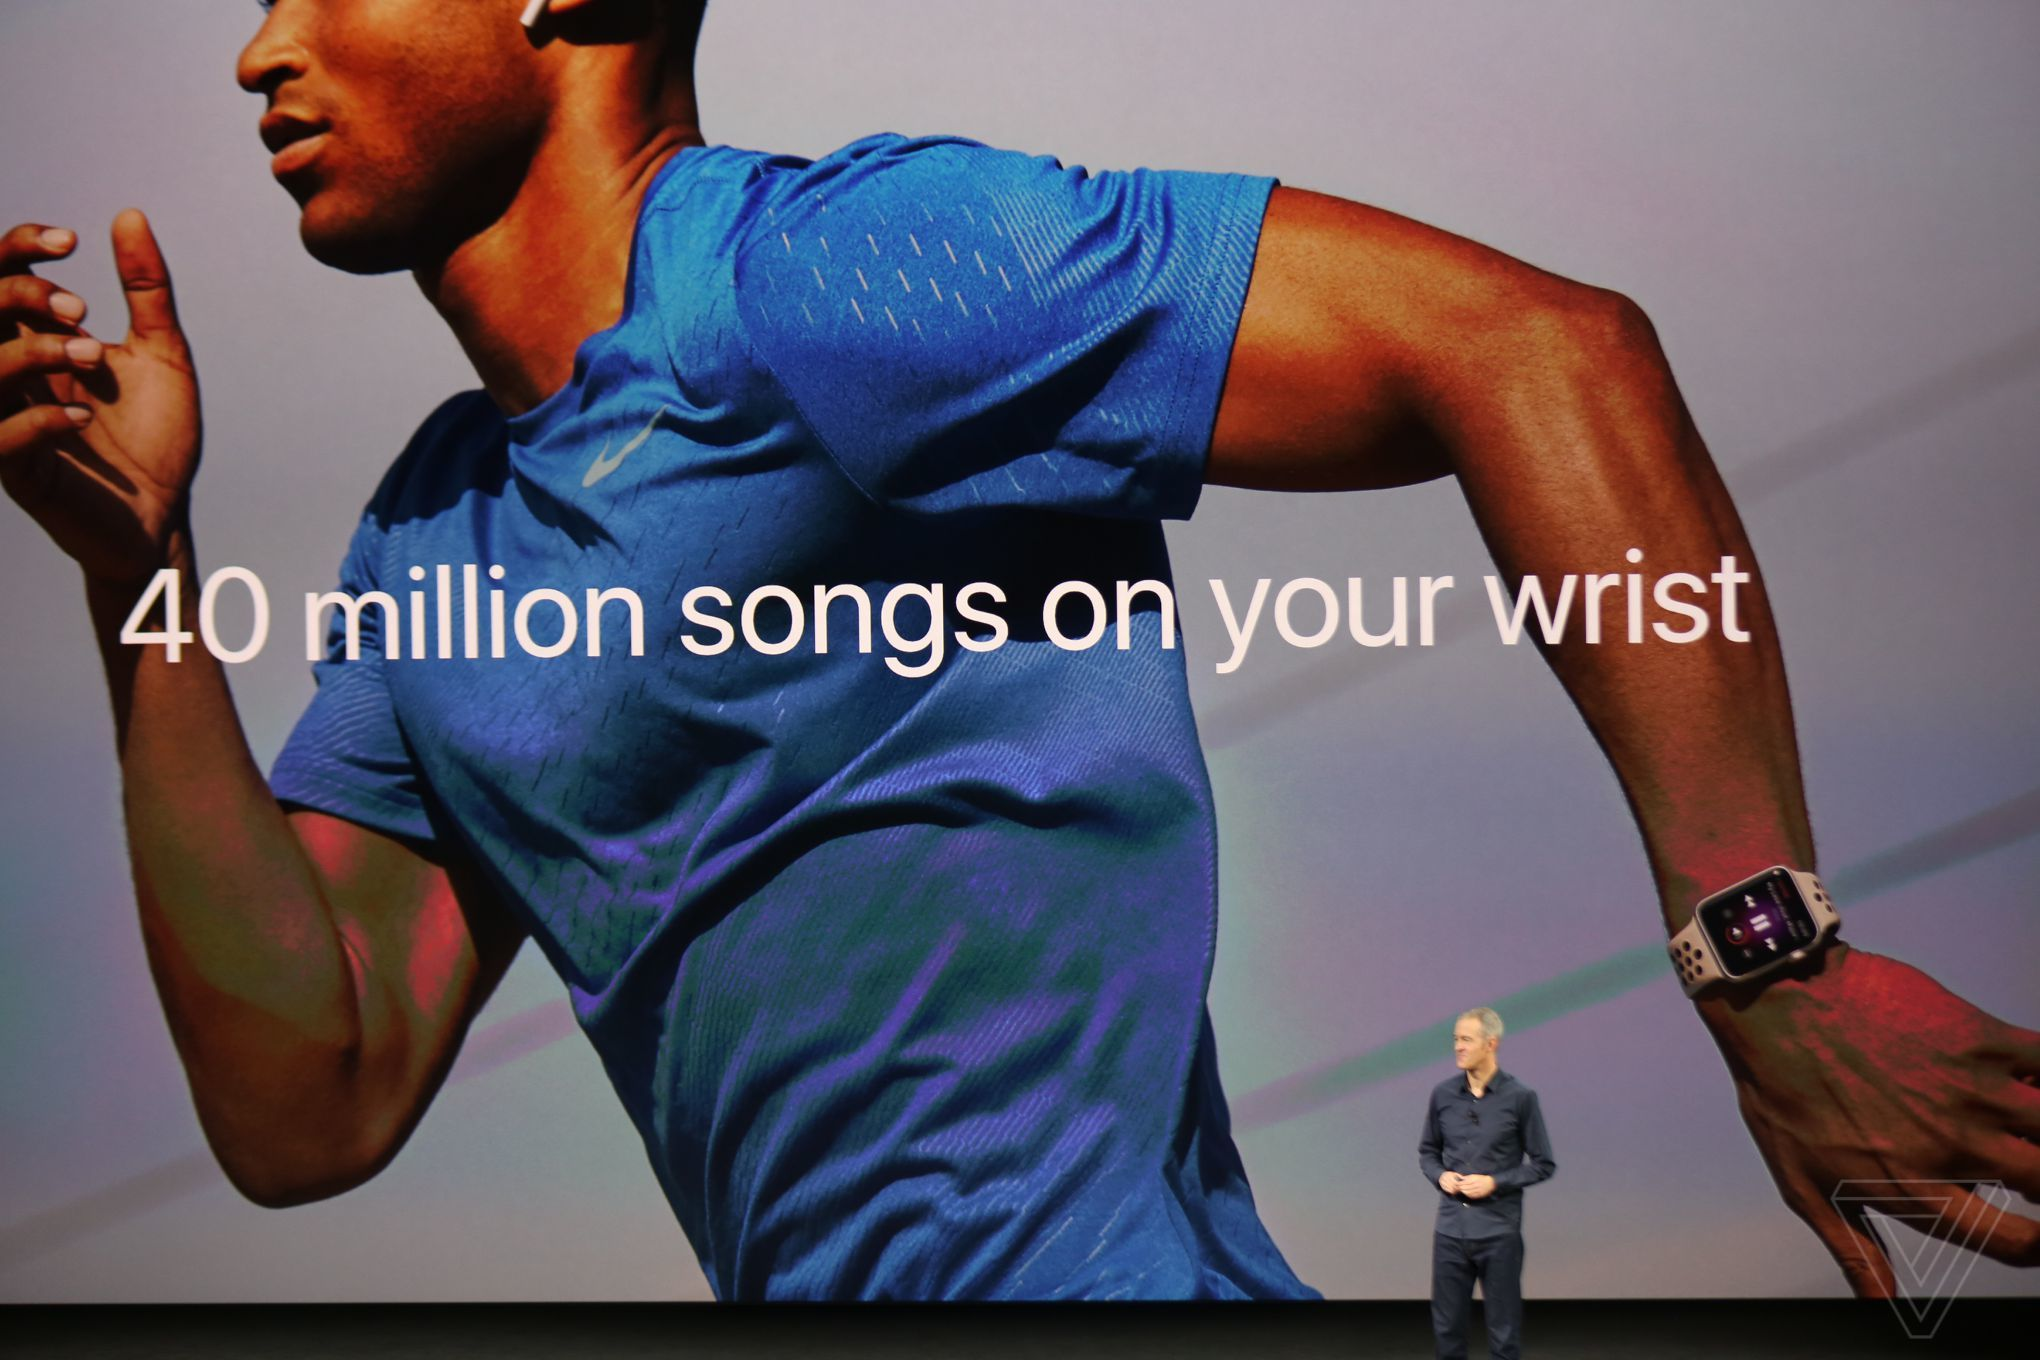 Apple Watch2 New Apple Series 3 Watch Slammed Apple Issue Statement